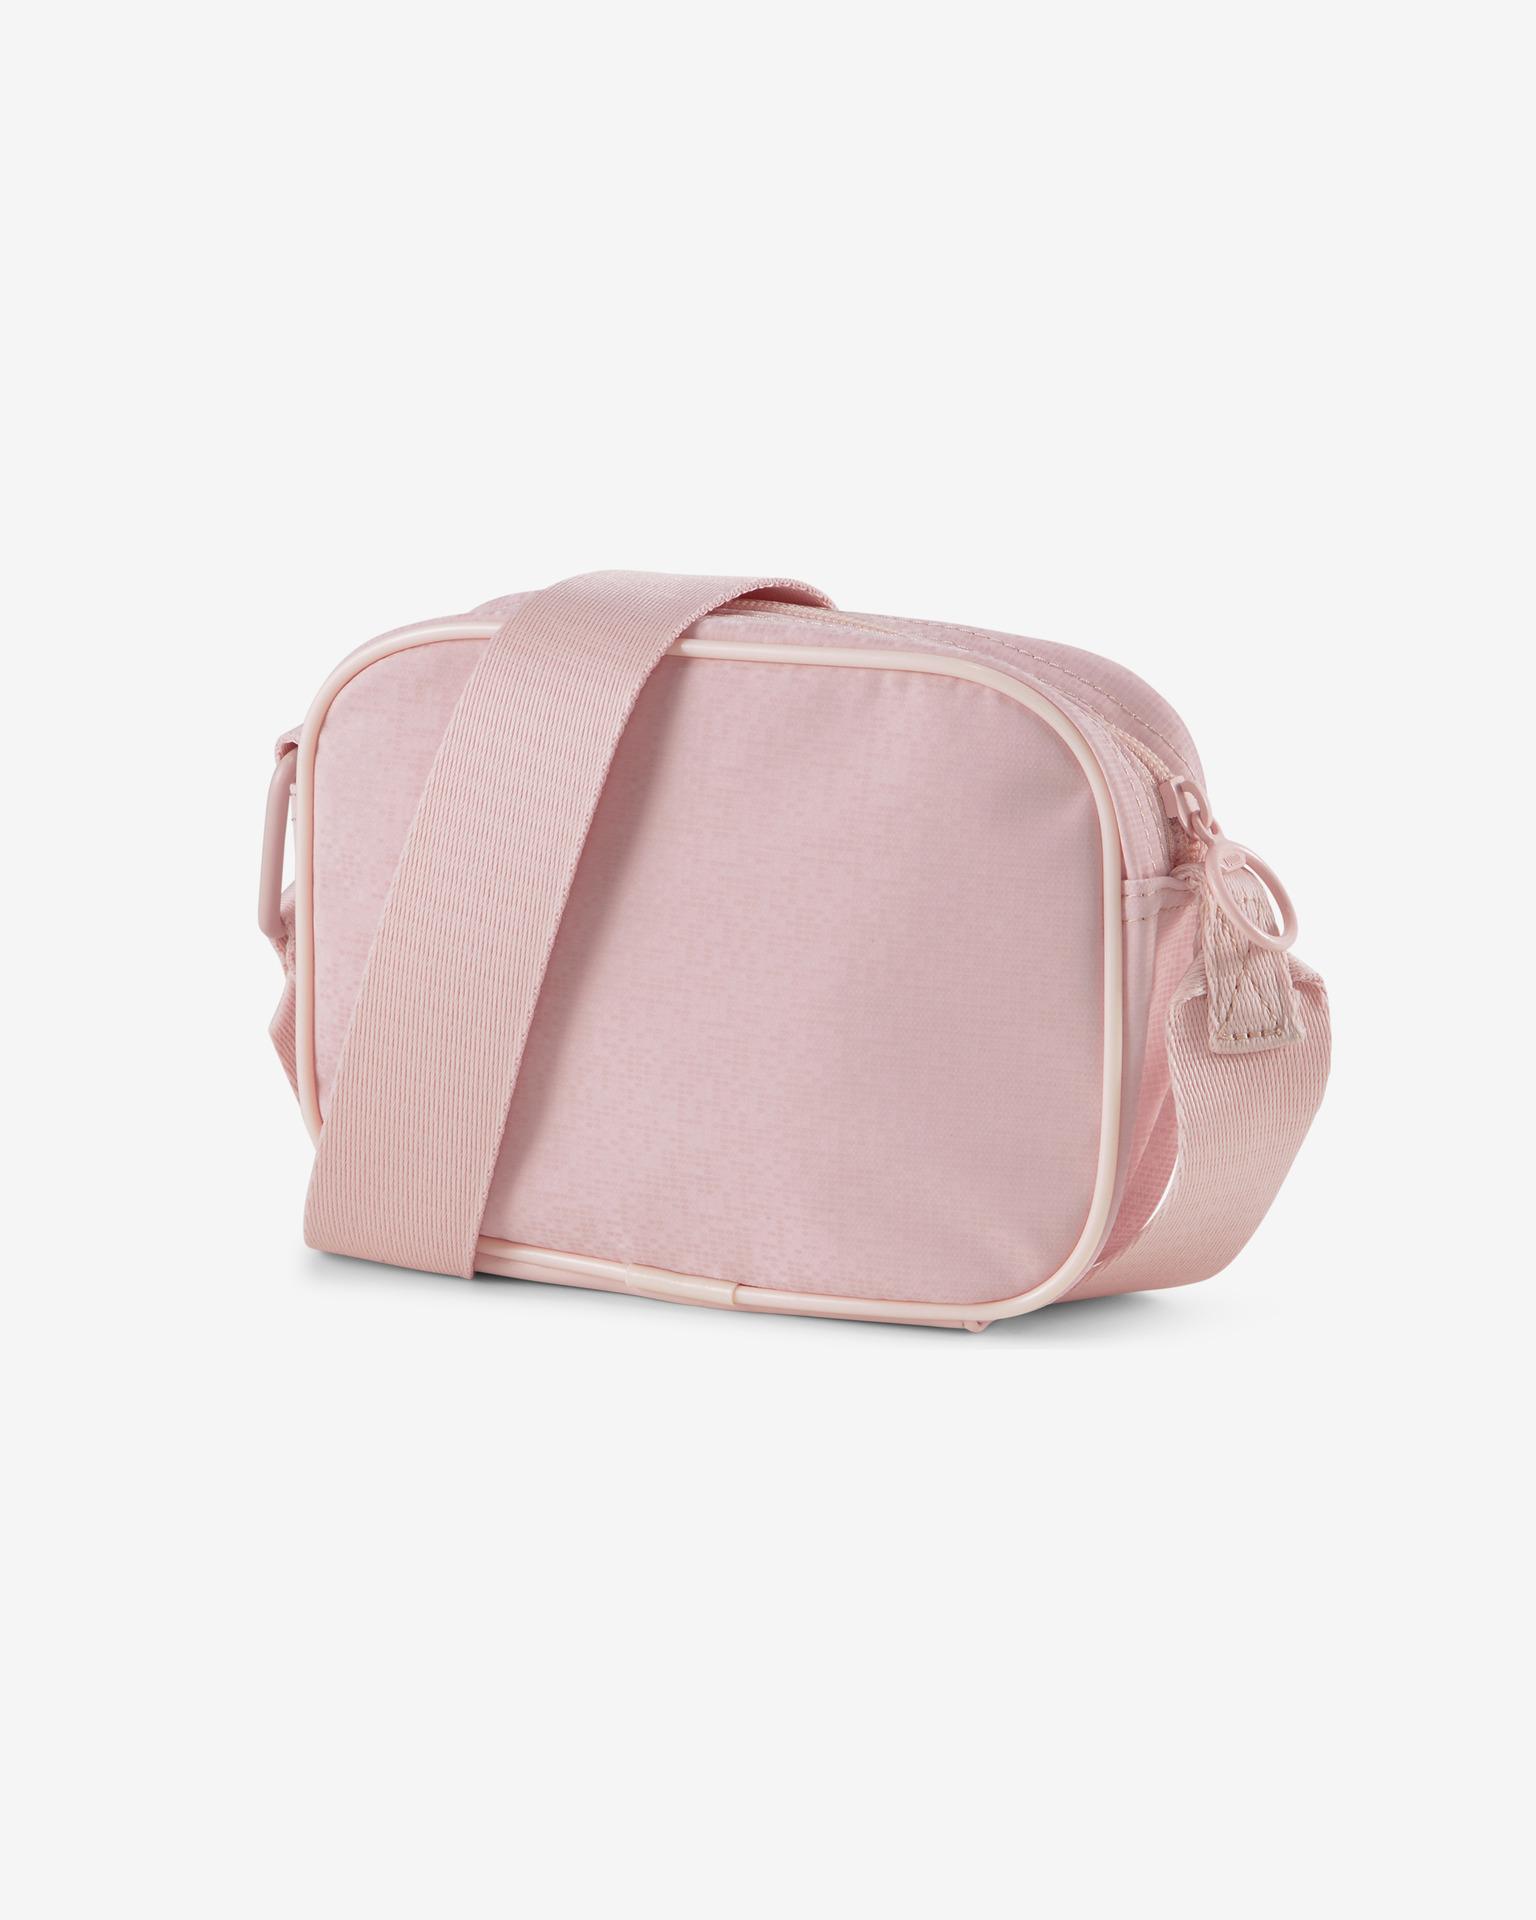 Puma Prime Time Cross body bag Pink